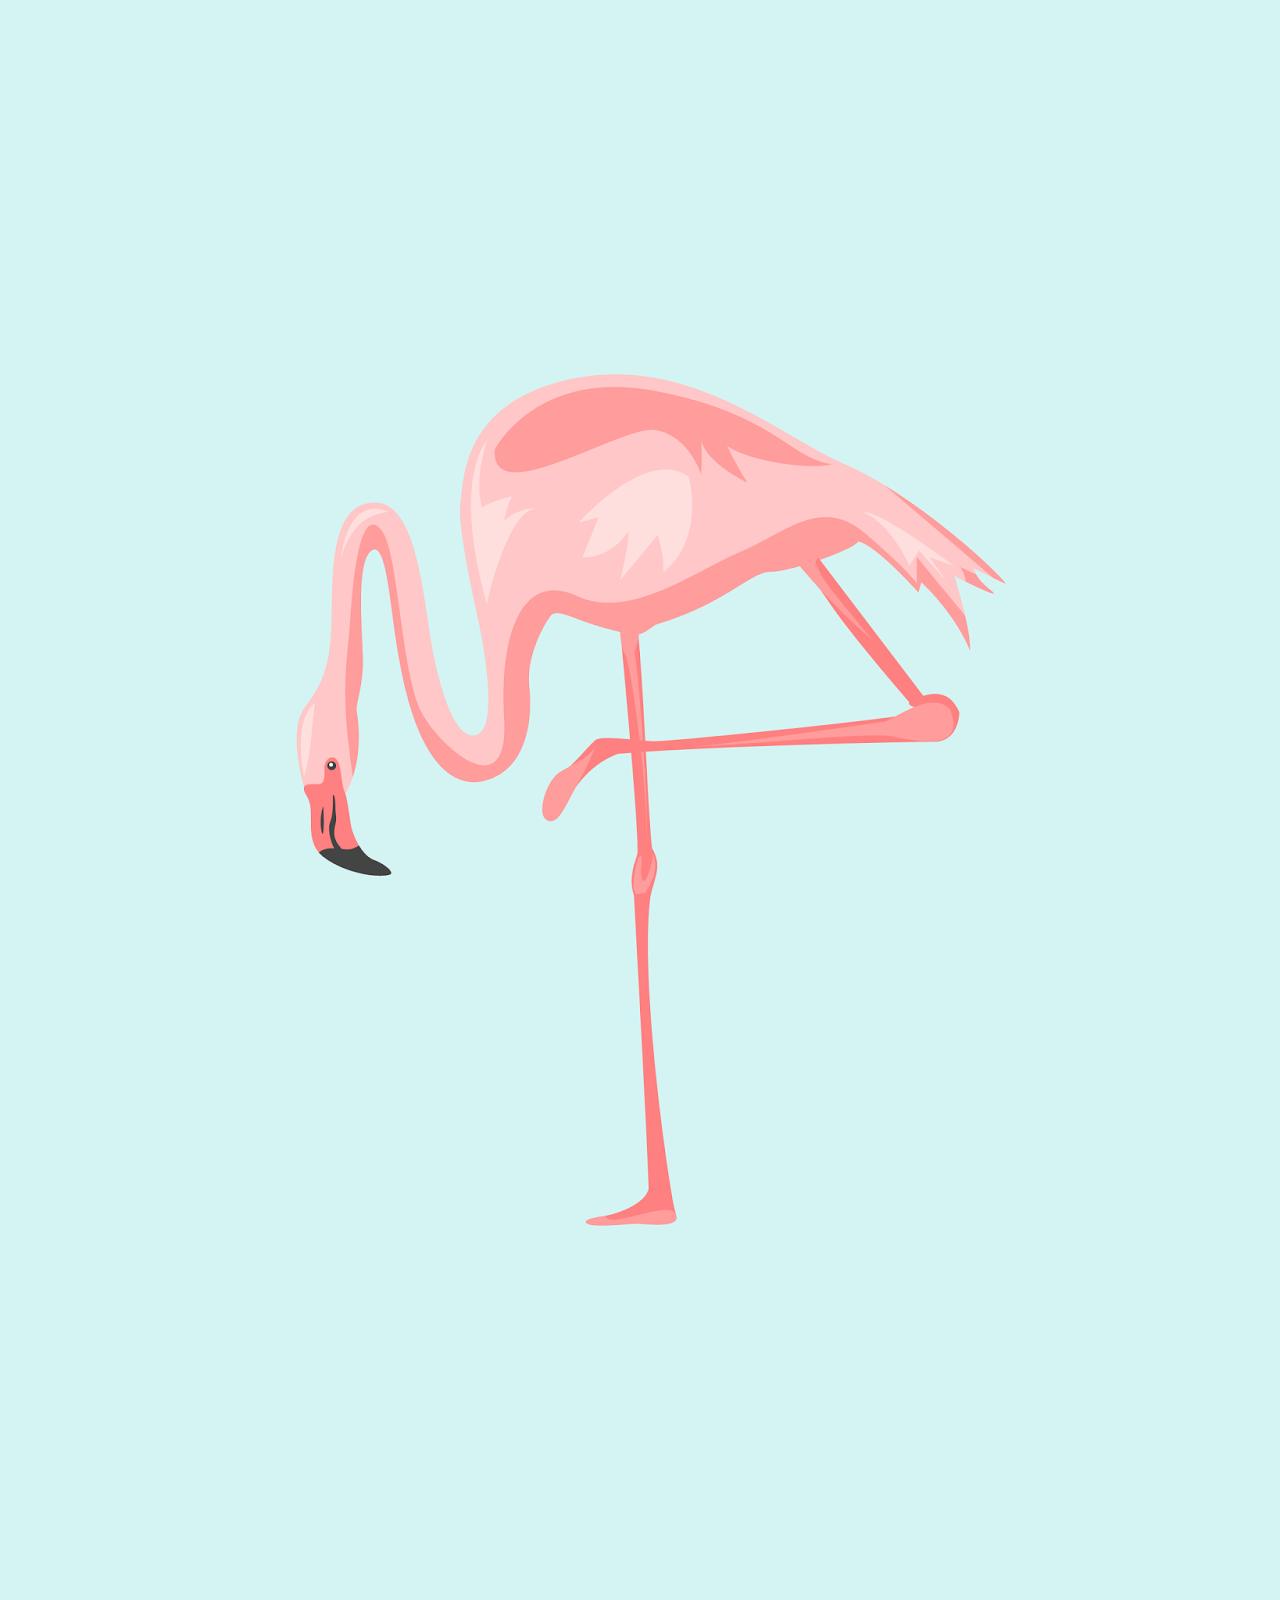 OhSoLovely-Flamingos-02